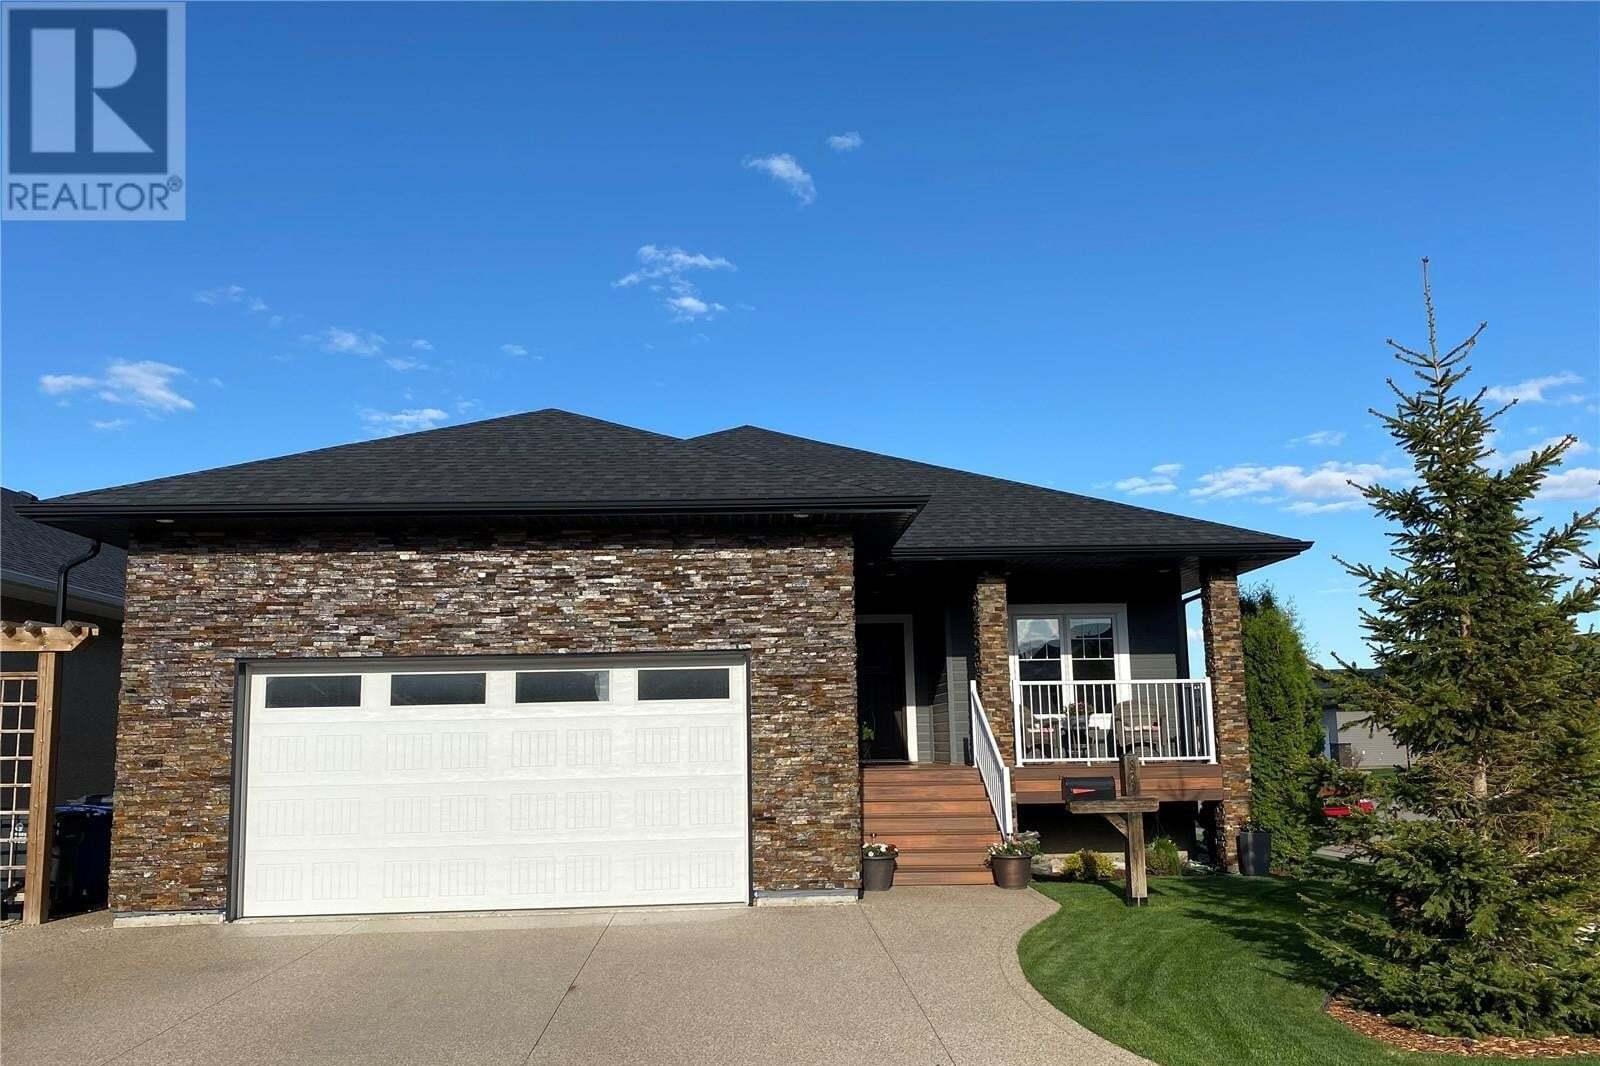 House for sale at 321 Player Cres Warman Saskatchewan - MLS: SK810164